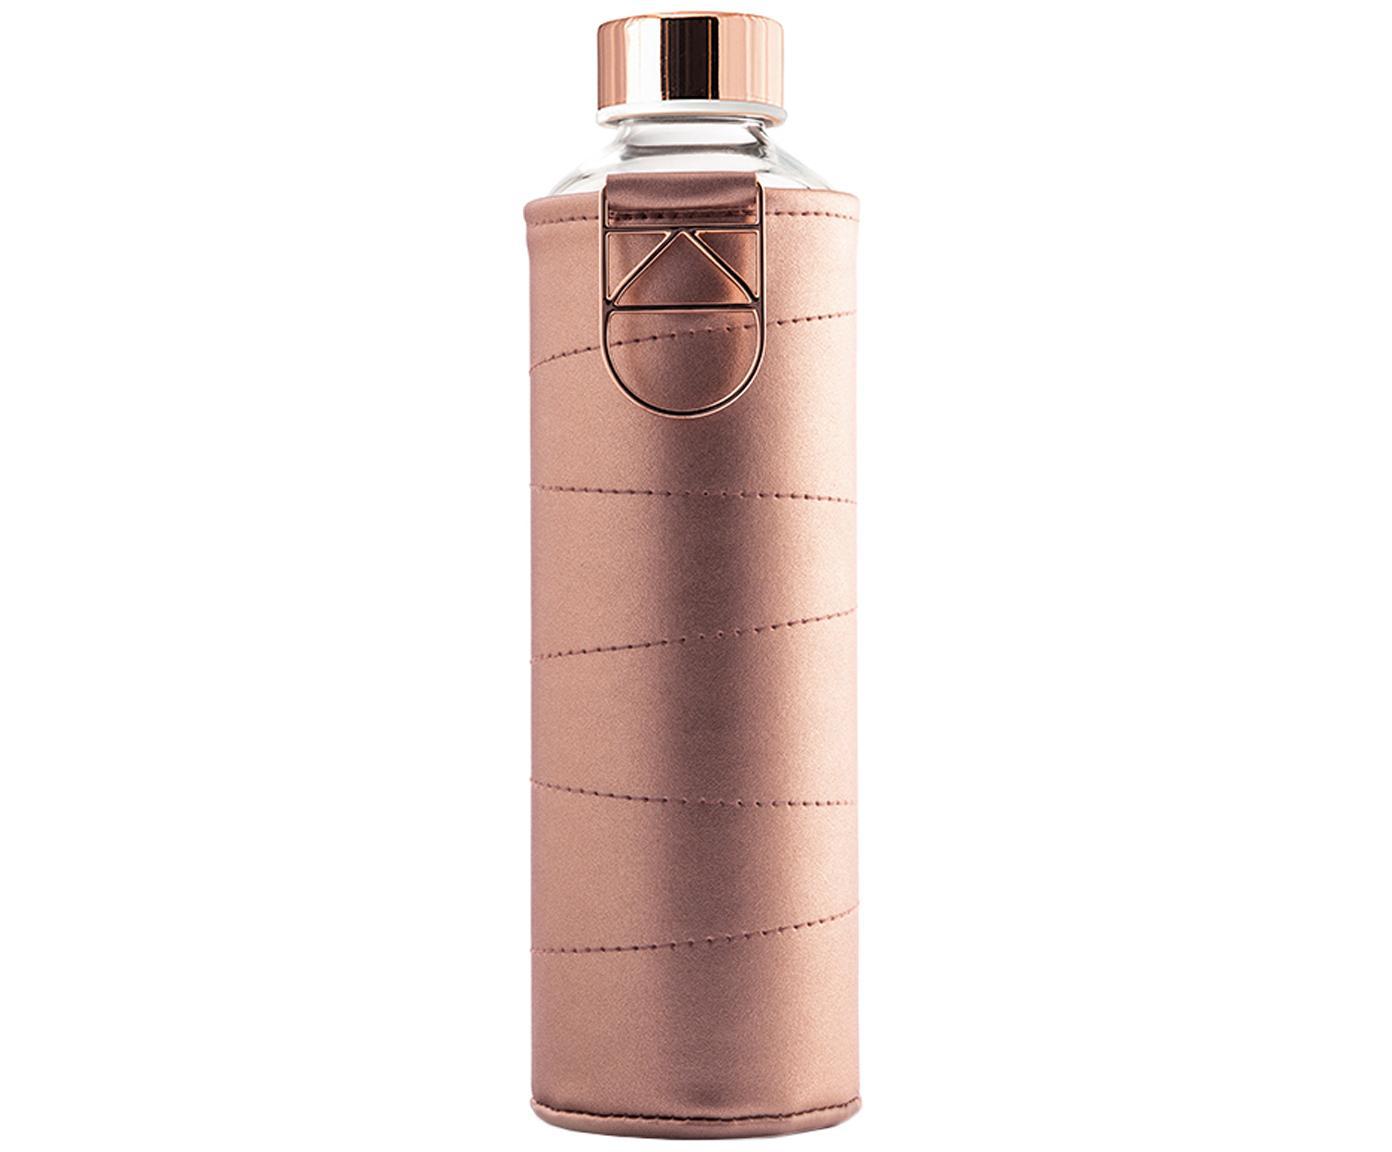 Botella Mismatch, Botella: vidrio borosilicato, Funda: cuero sintético, Rosa dorado, transparente, Ø 8 x Al 26 cm